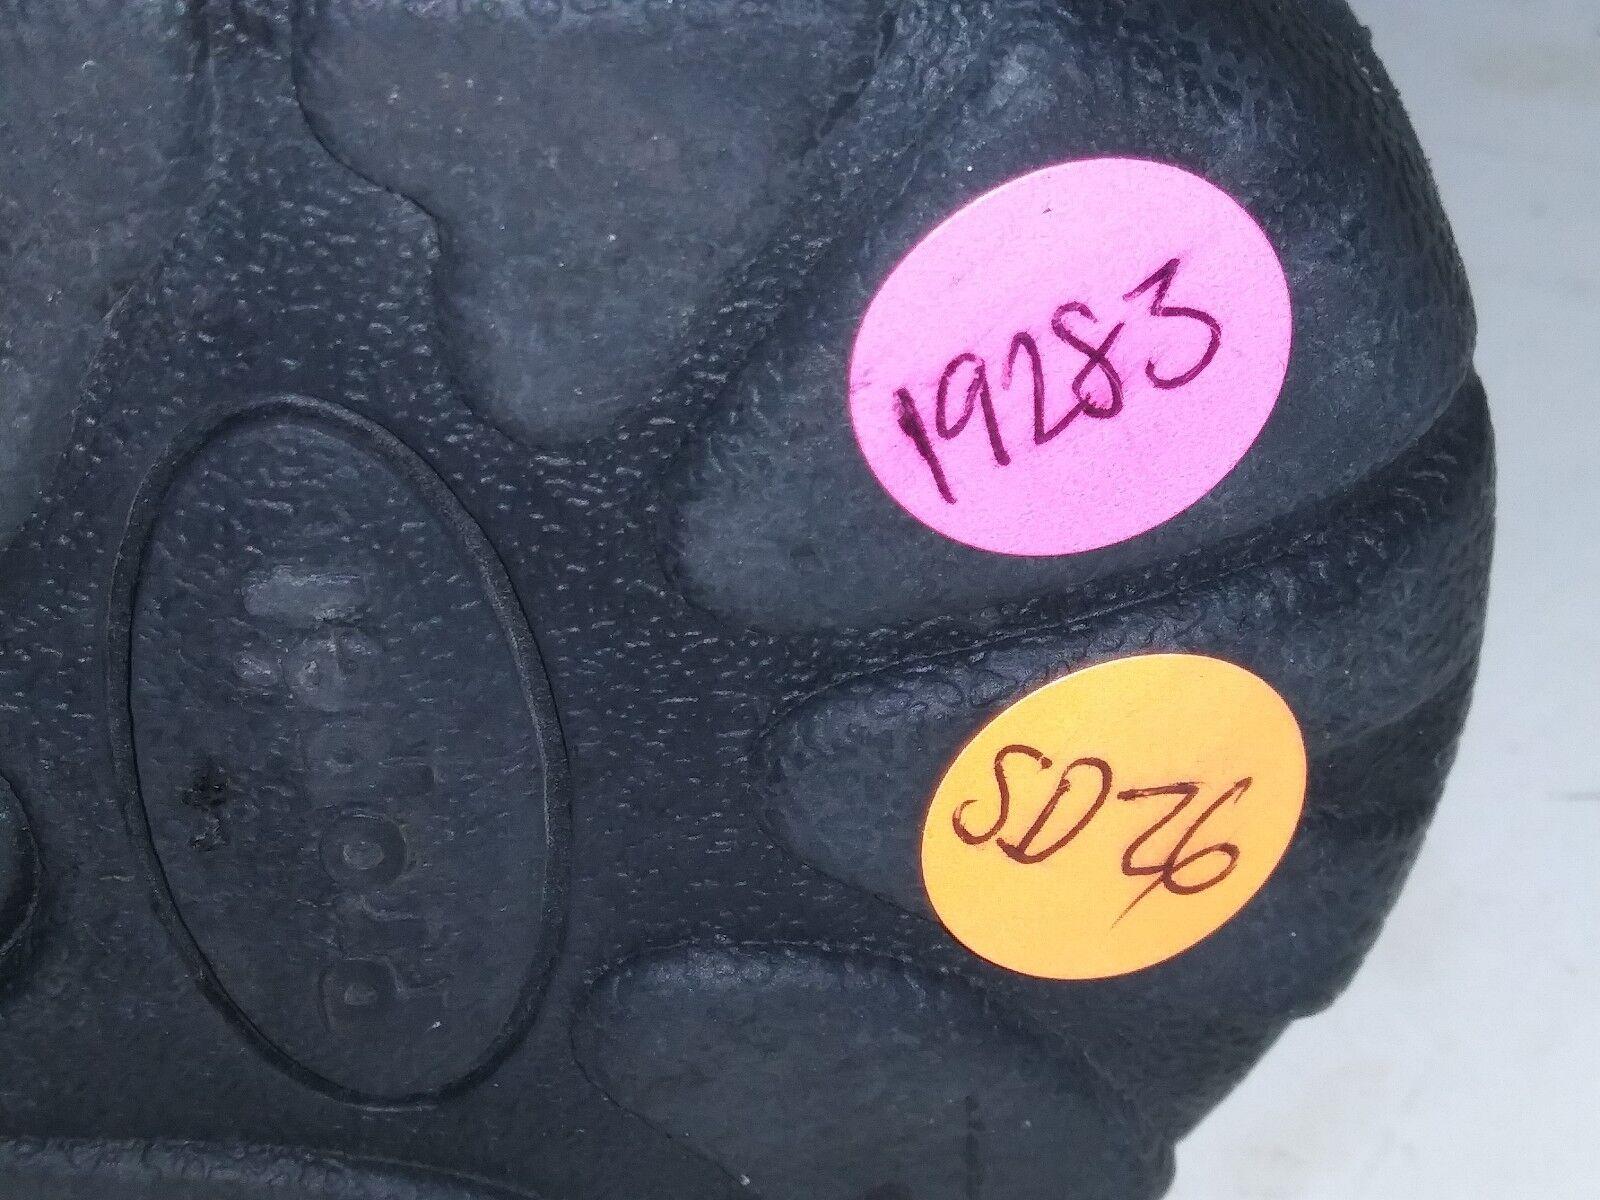 Propet M3856 Wash and Loop Wear Tie Black Hook Loop and Walking Shoes Mens Size 12 M f50076